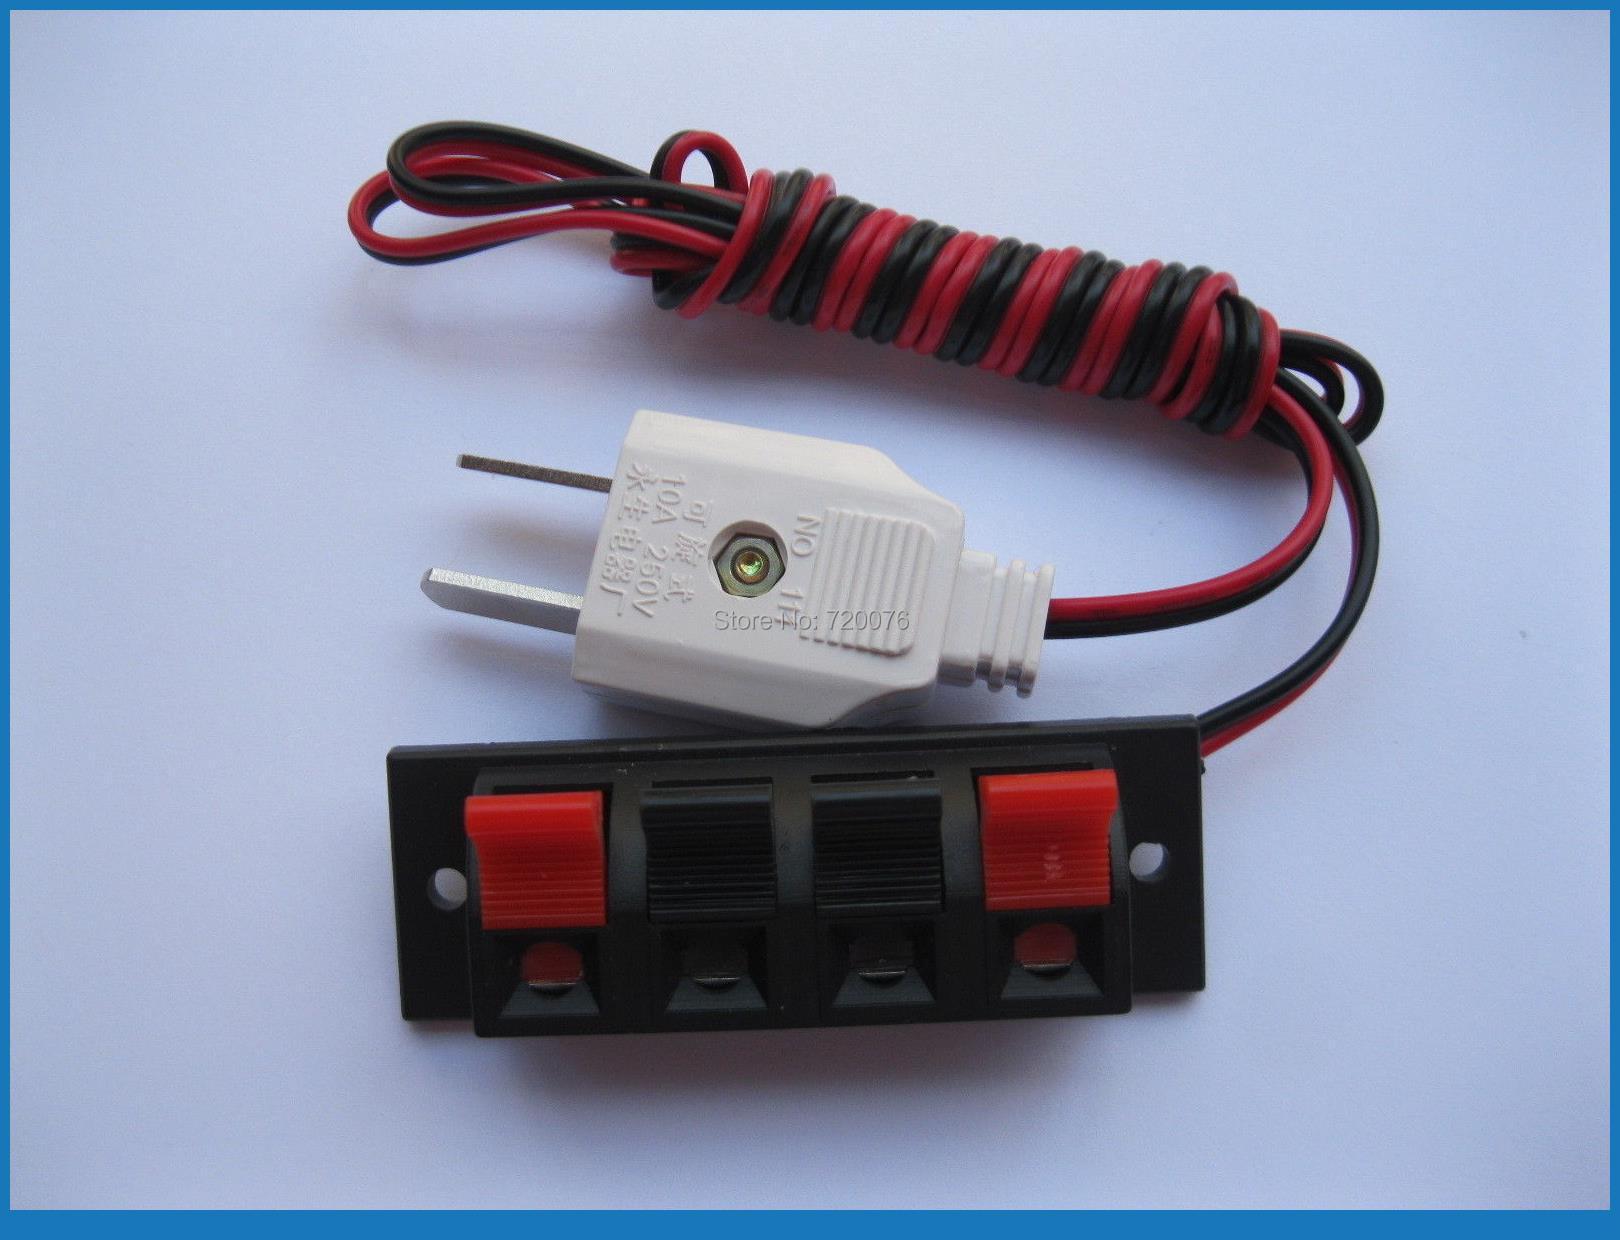 20 pcs Speaker Terminal Board Spring Loaded 4-Way With Adapter Plug 1.5m коляска трость jetem twist violet